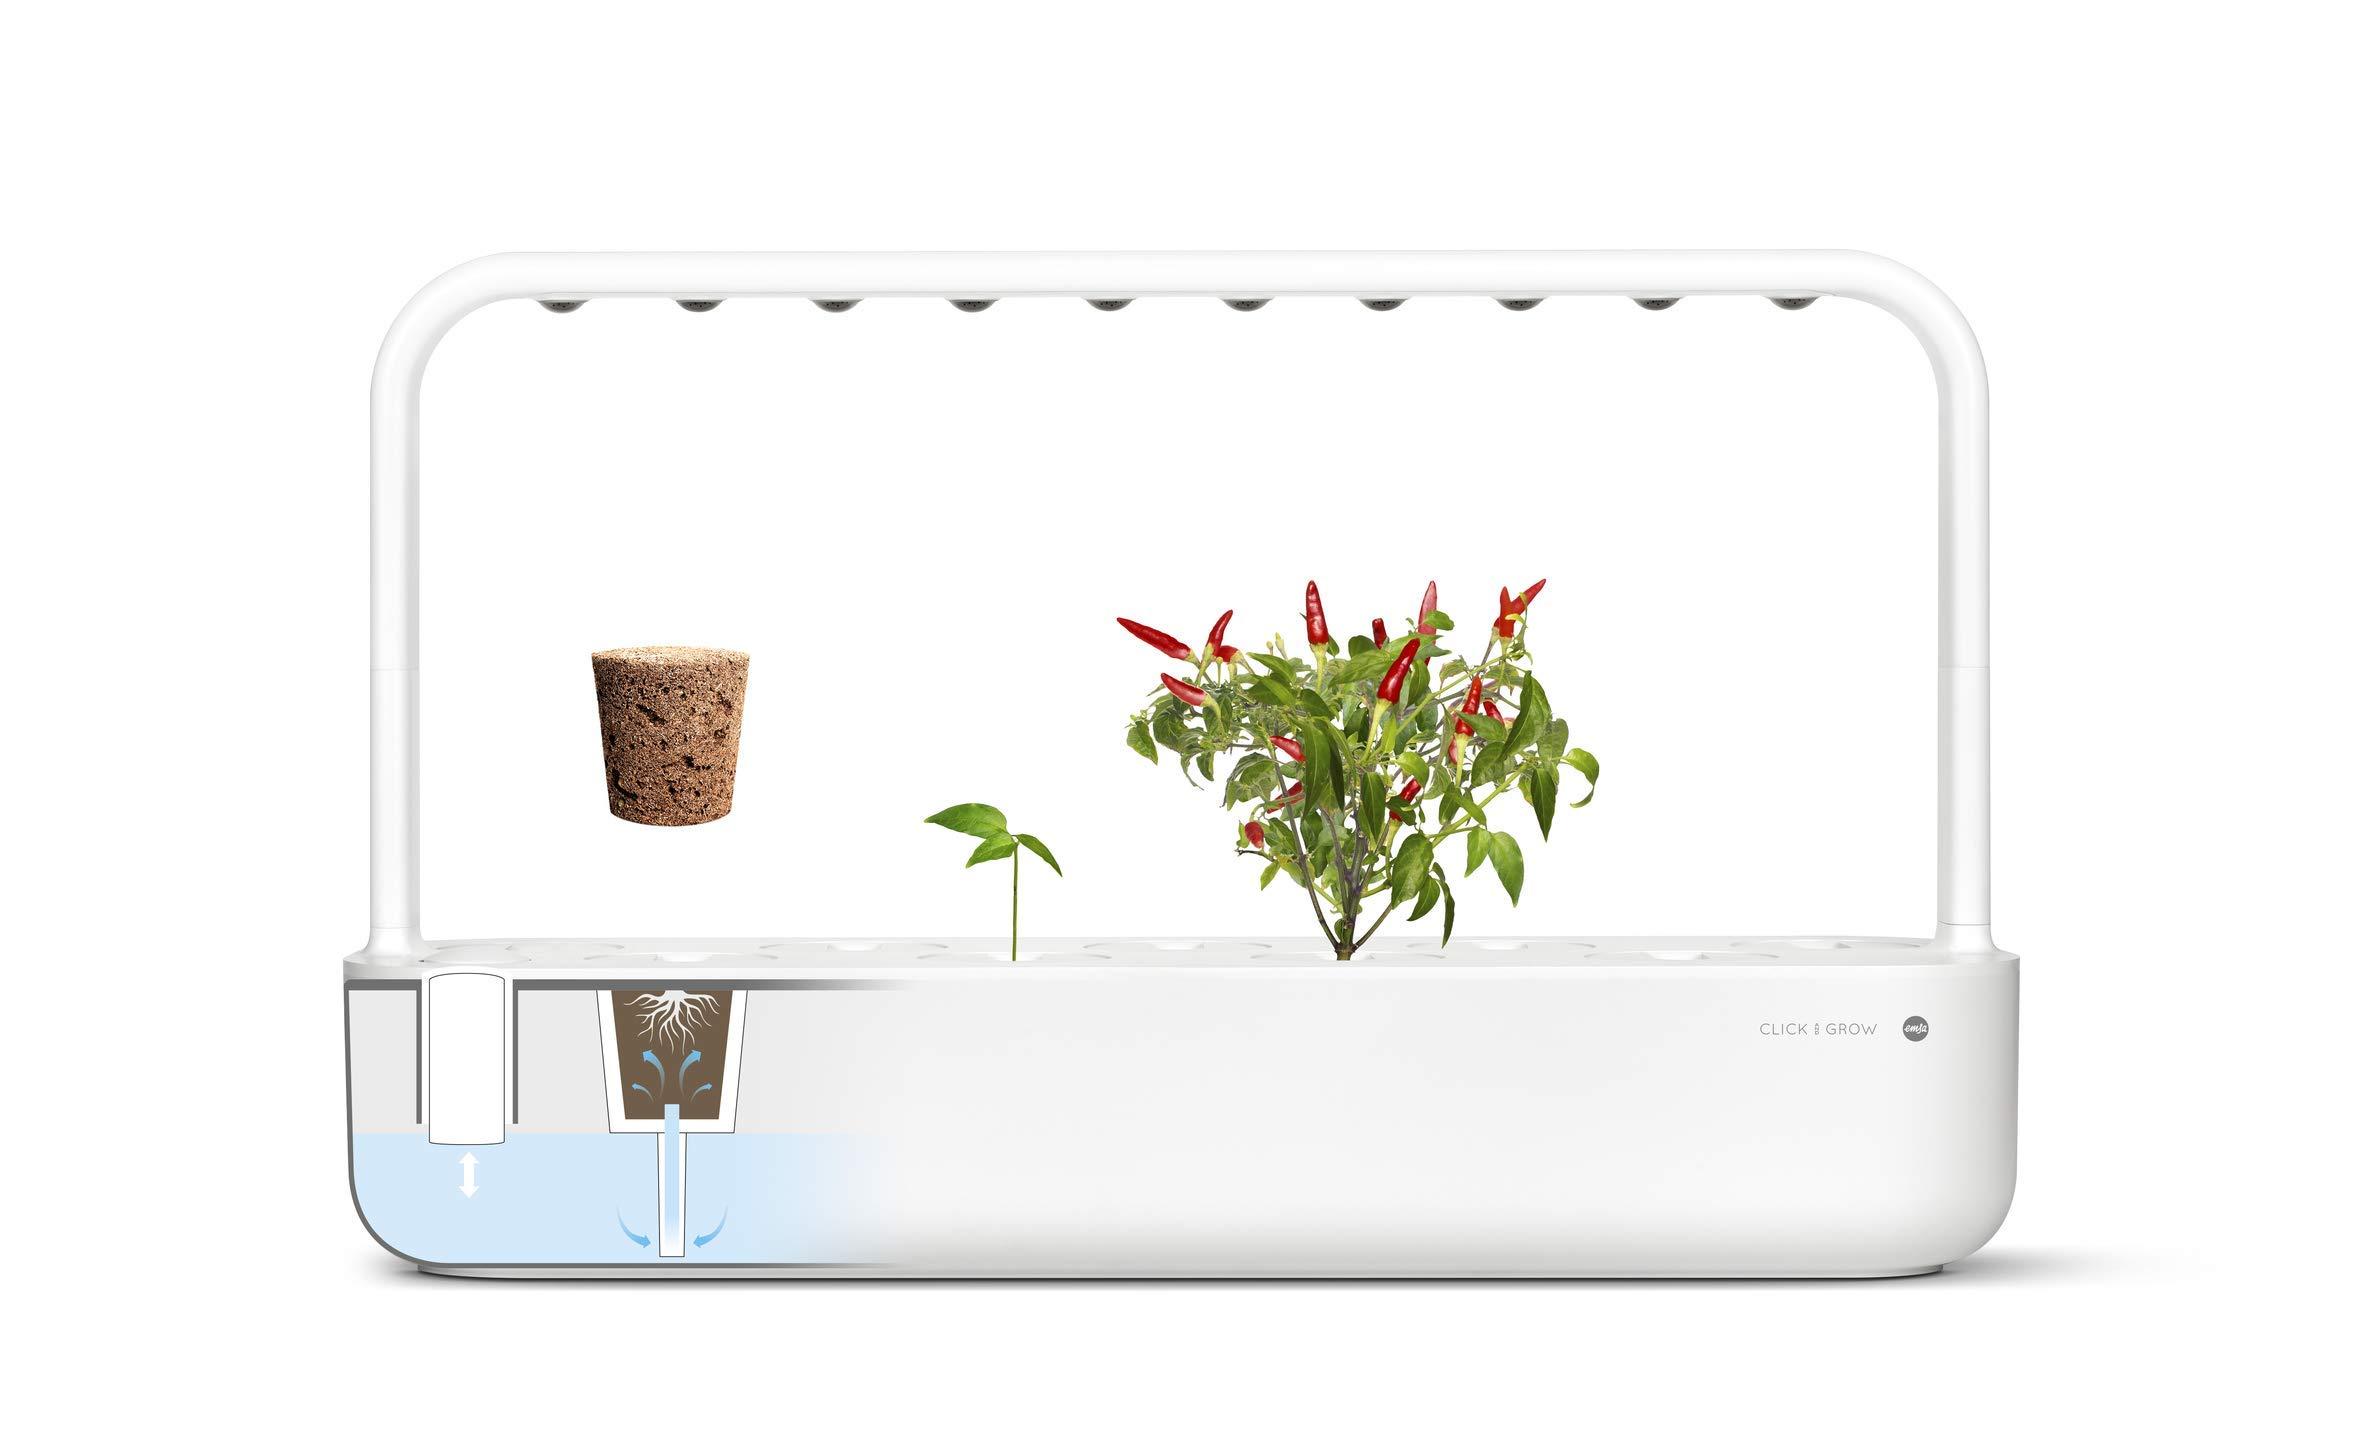 Emsa Click & Grow Smart Garden 9 unidades M52619, Semillas Smart ...